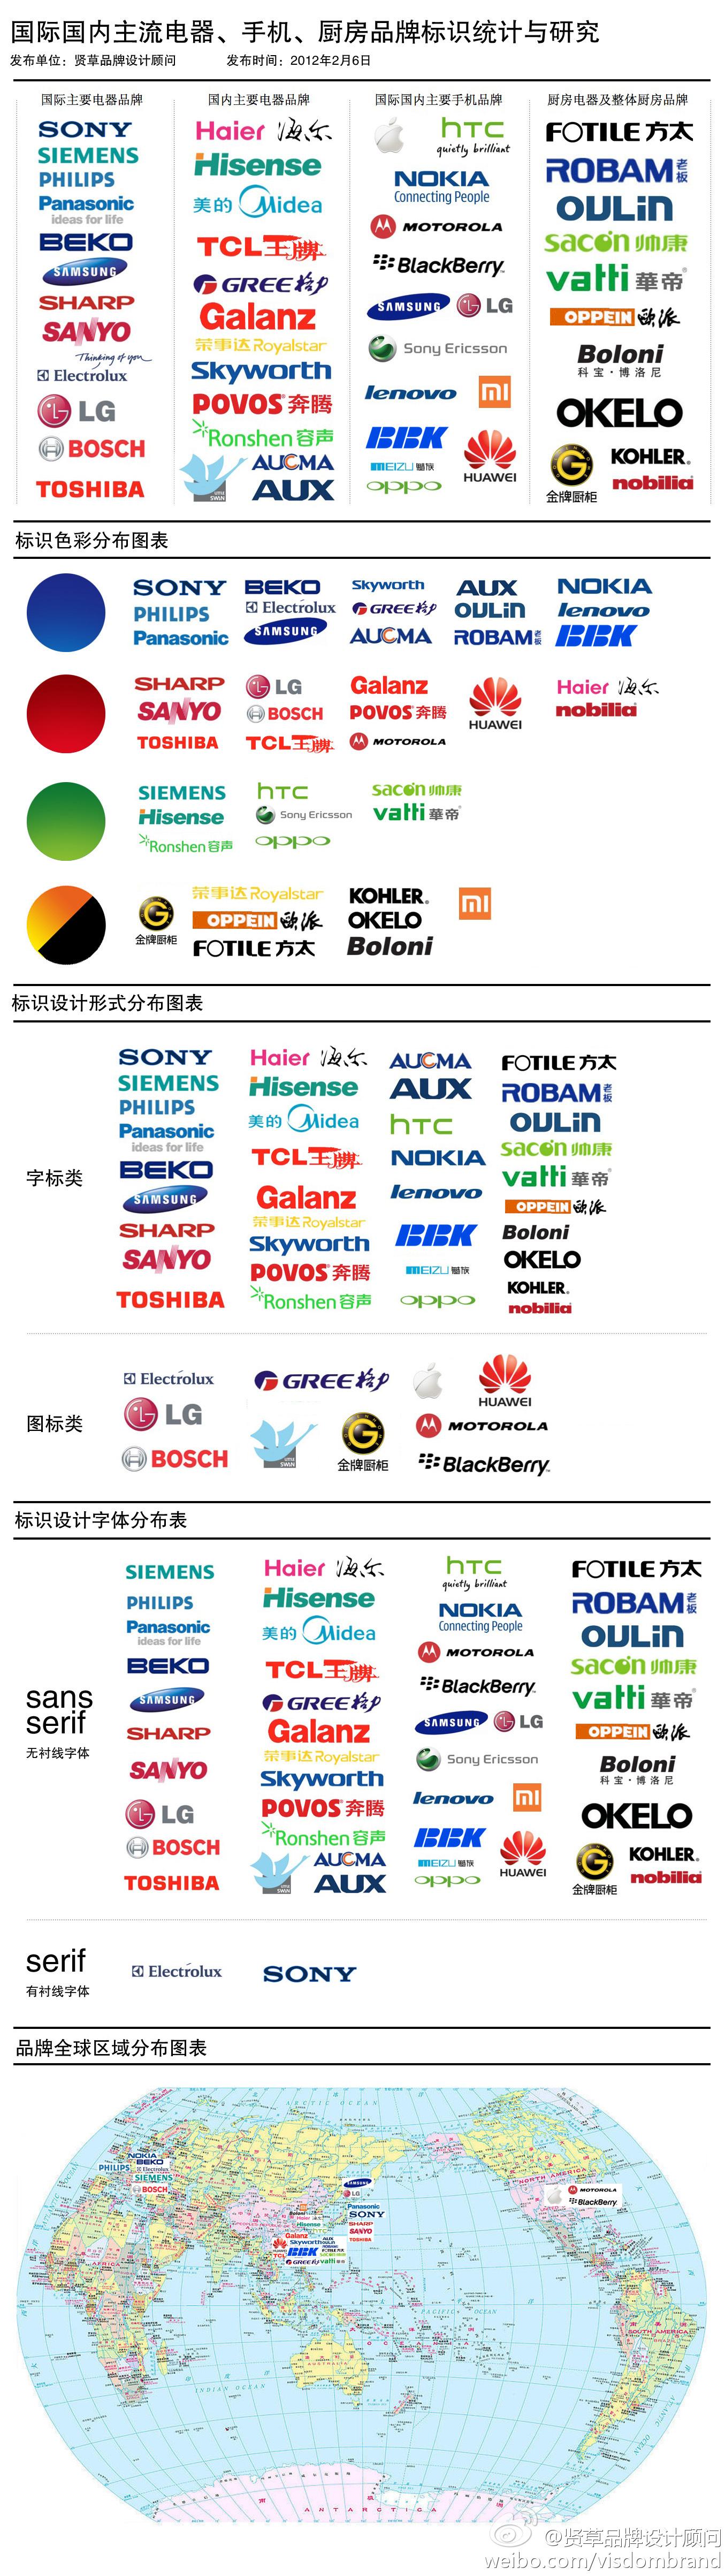 66dd8081tw1dptk0stu4kj 国际国内主要电器、手机、厨房品牌标识研究